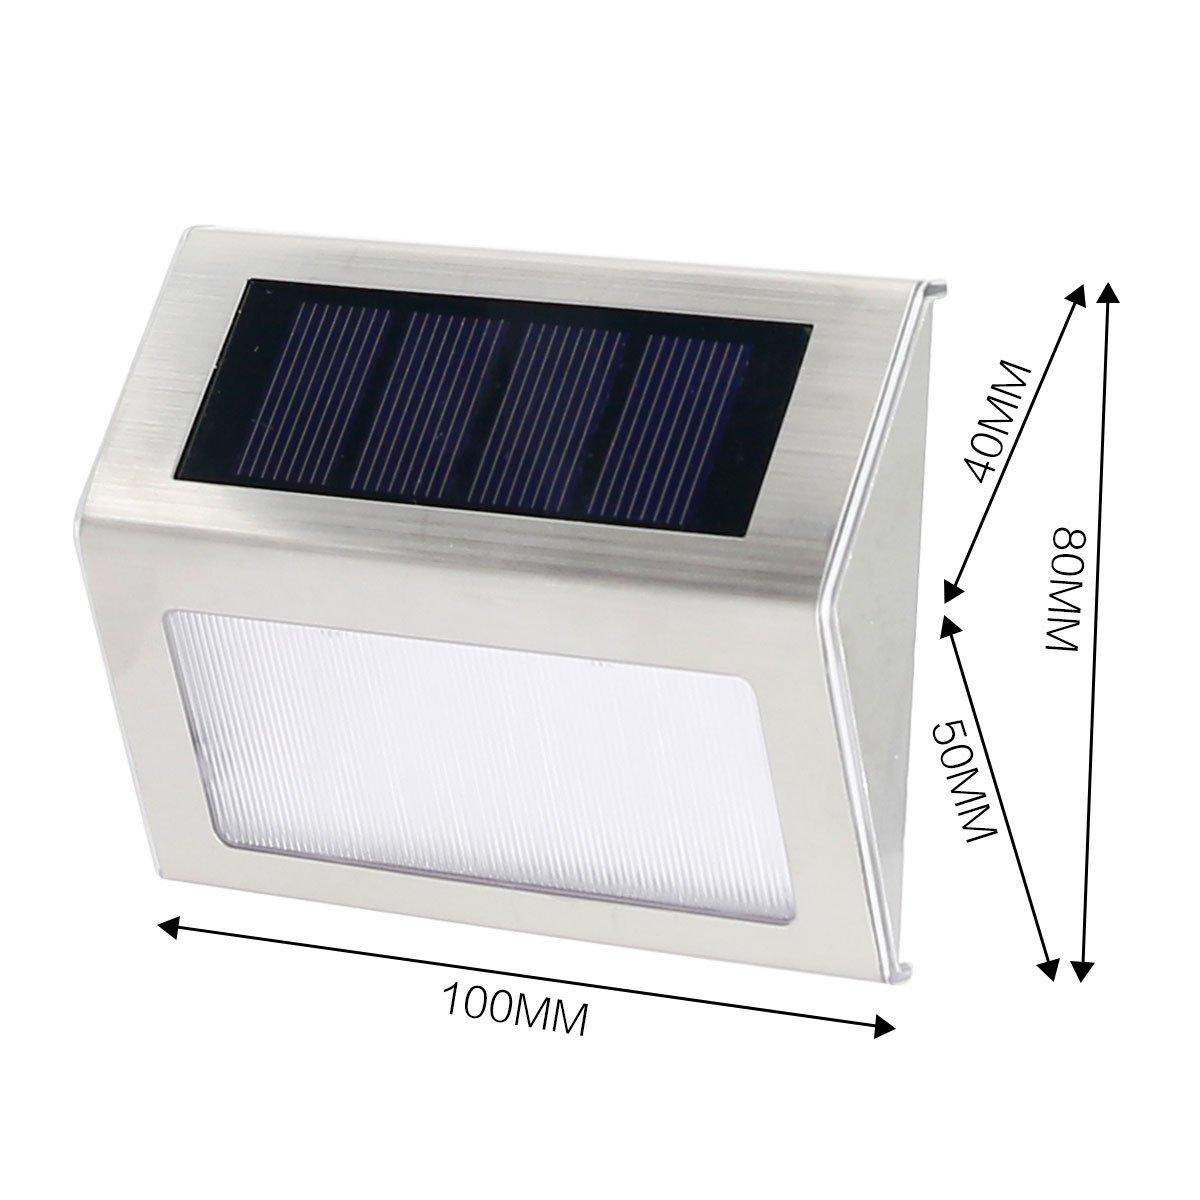 Seeteck solar lights outdoor,Solar Step Lights Outdoor Waterproof with led lights, mini Solar Stair Lights for Garden Deck Fence or Patio, 2 Pack (White Light)